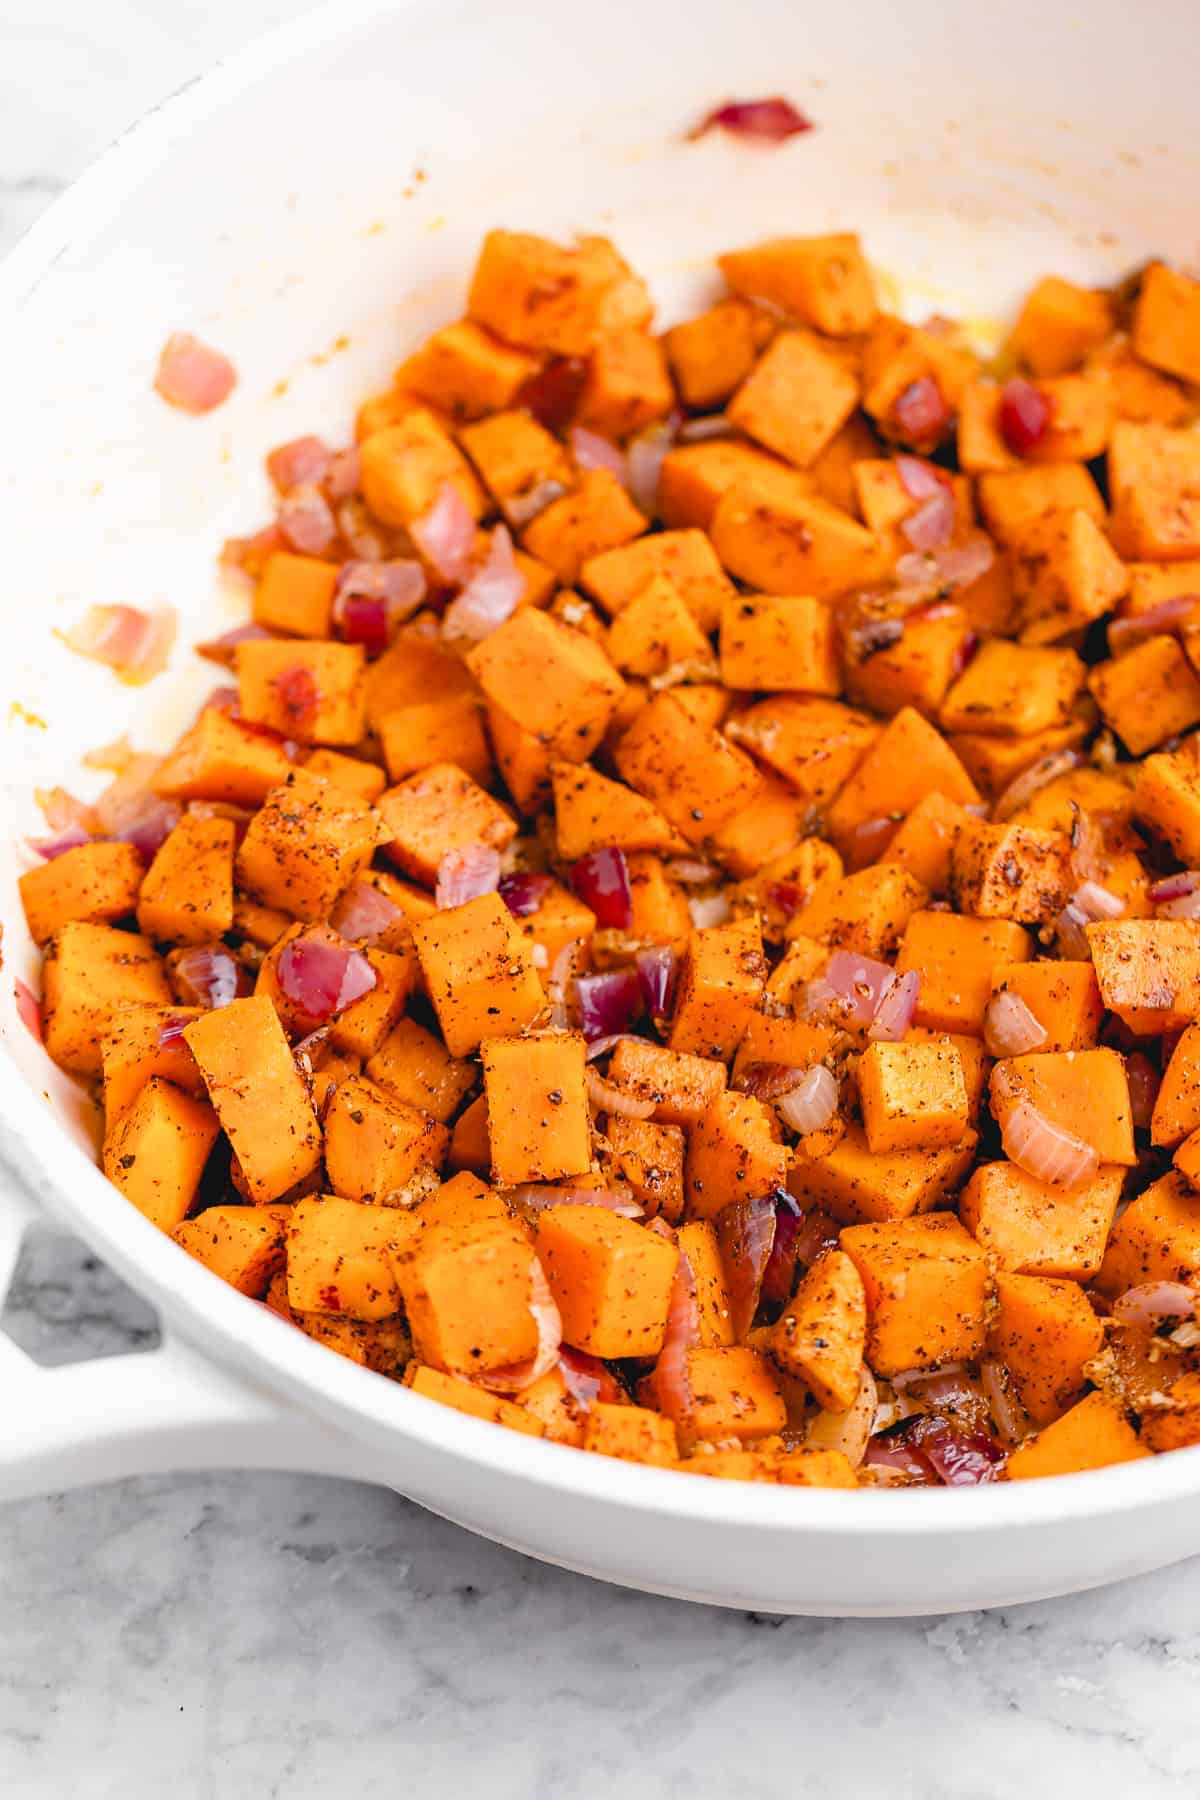 Pan of sautéed red onion and sweet potatoes.